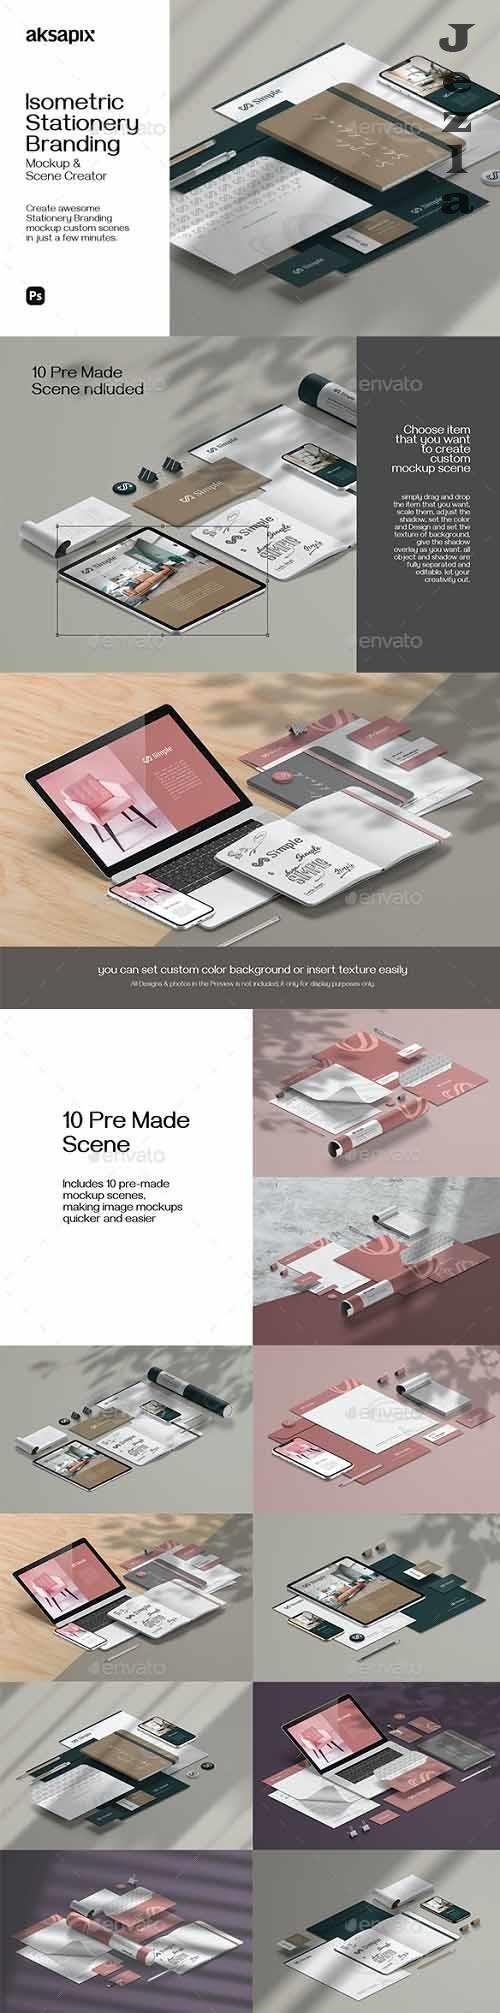 GraphicRiver - Isometric Stationery Branding - Mockup Scene Creator 30198161